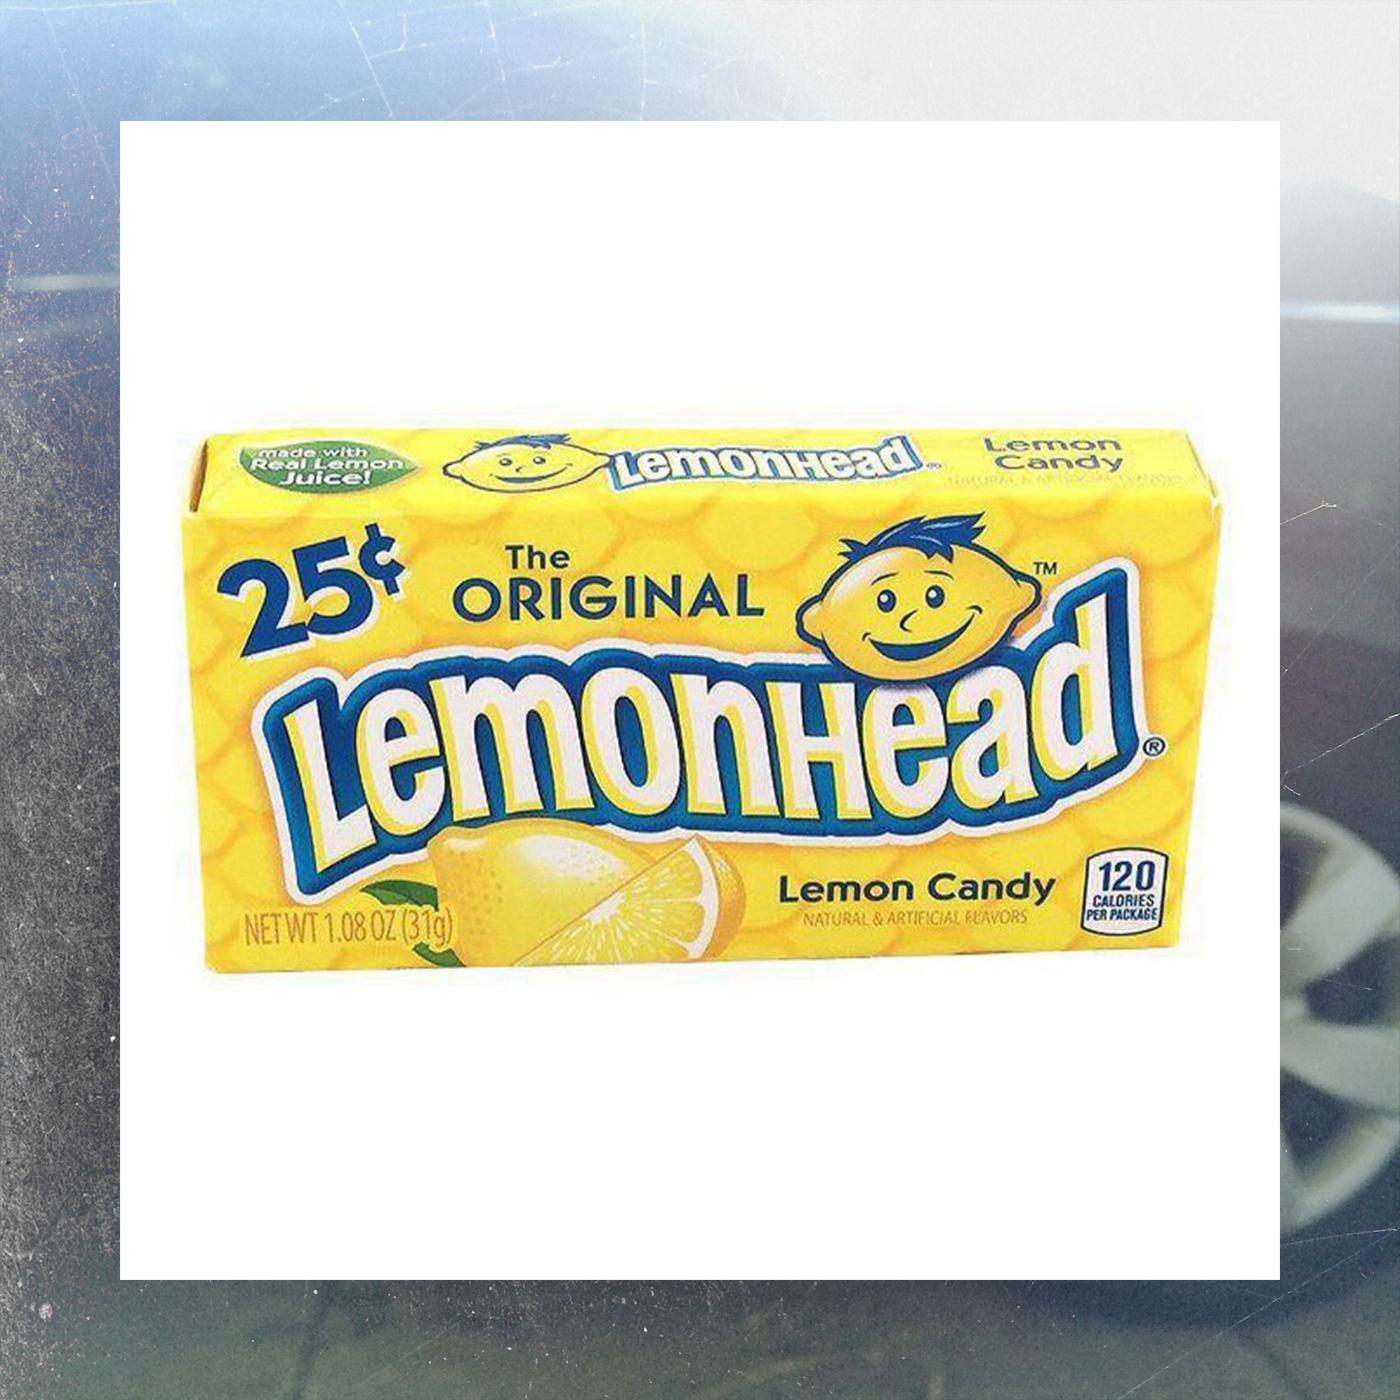 A box of Lemonheads